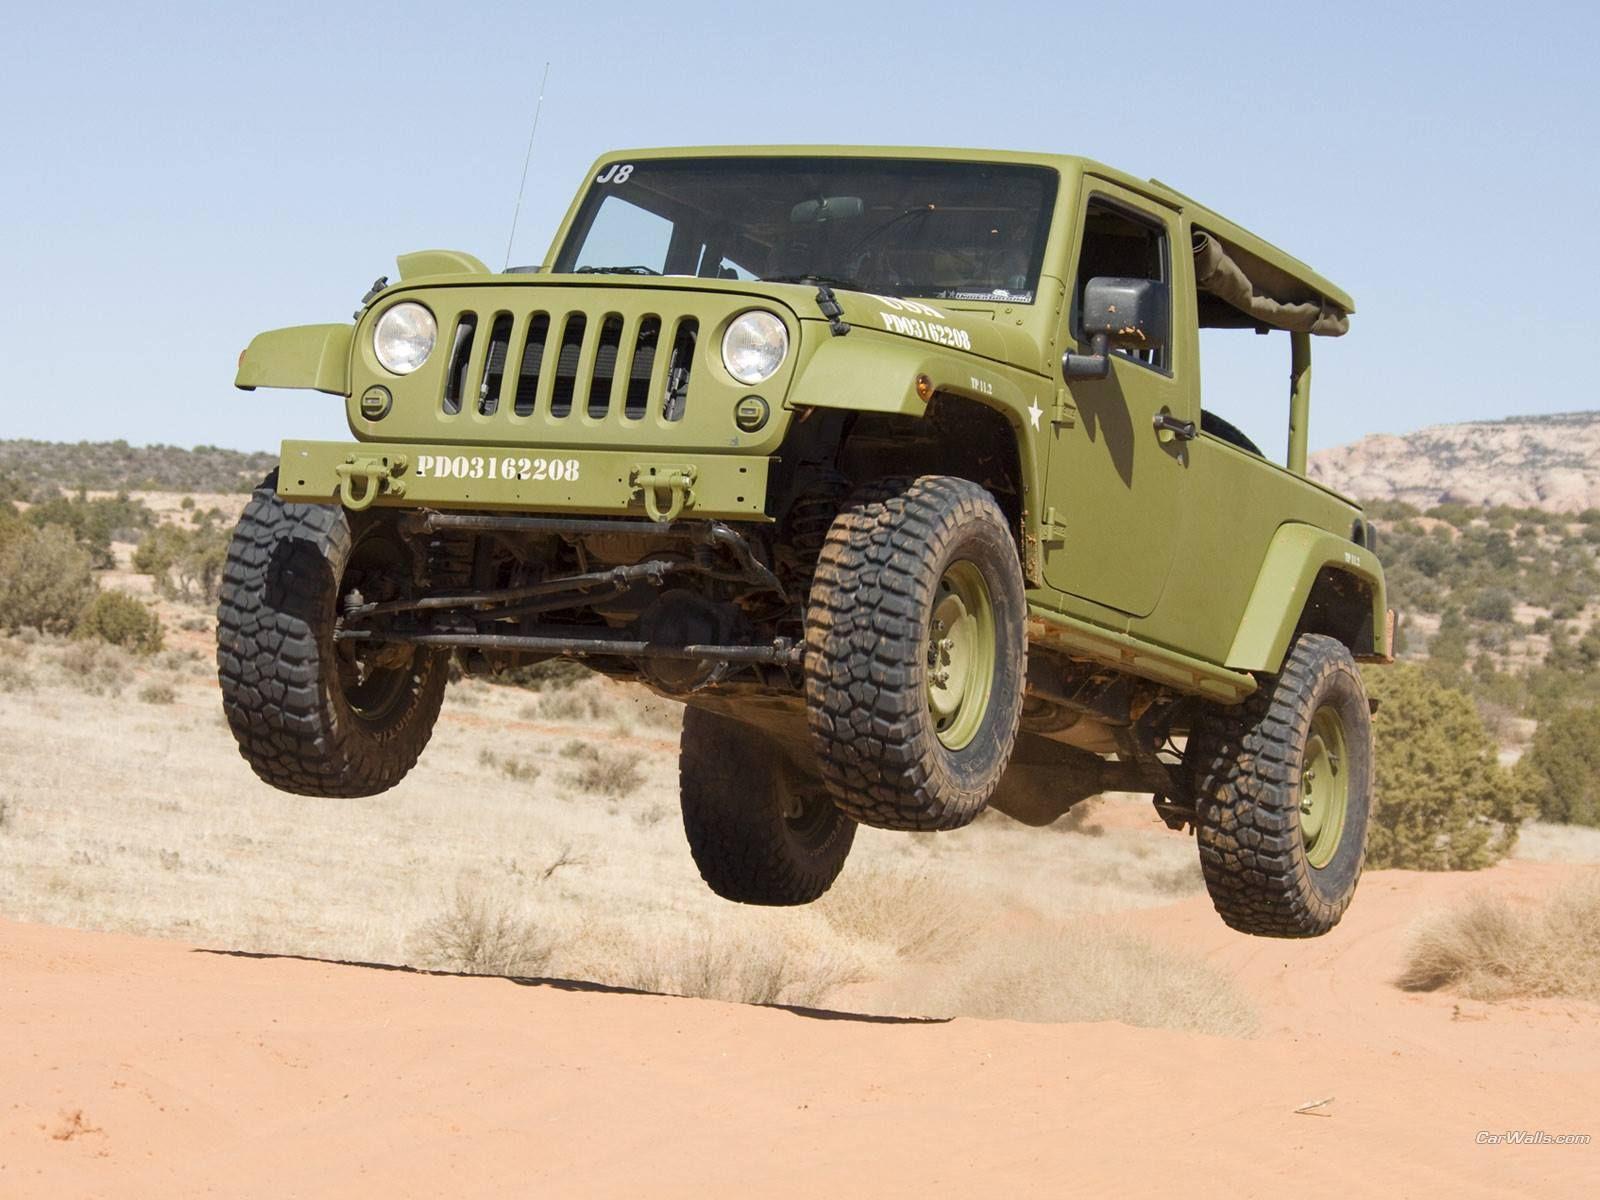 jeep jk8 wrangler jeeps Pinterest